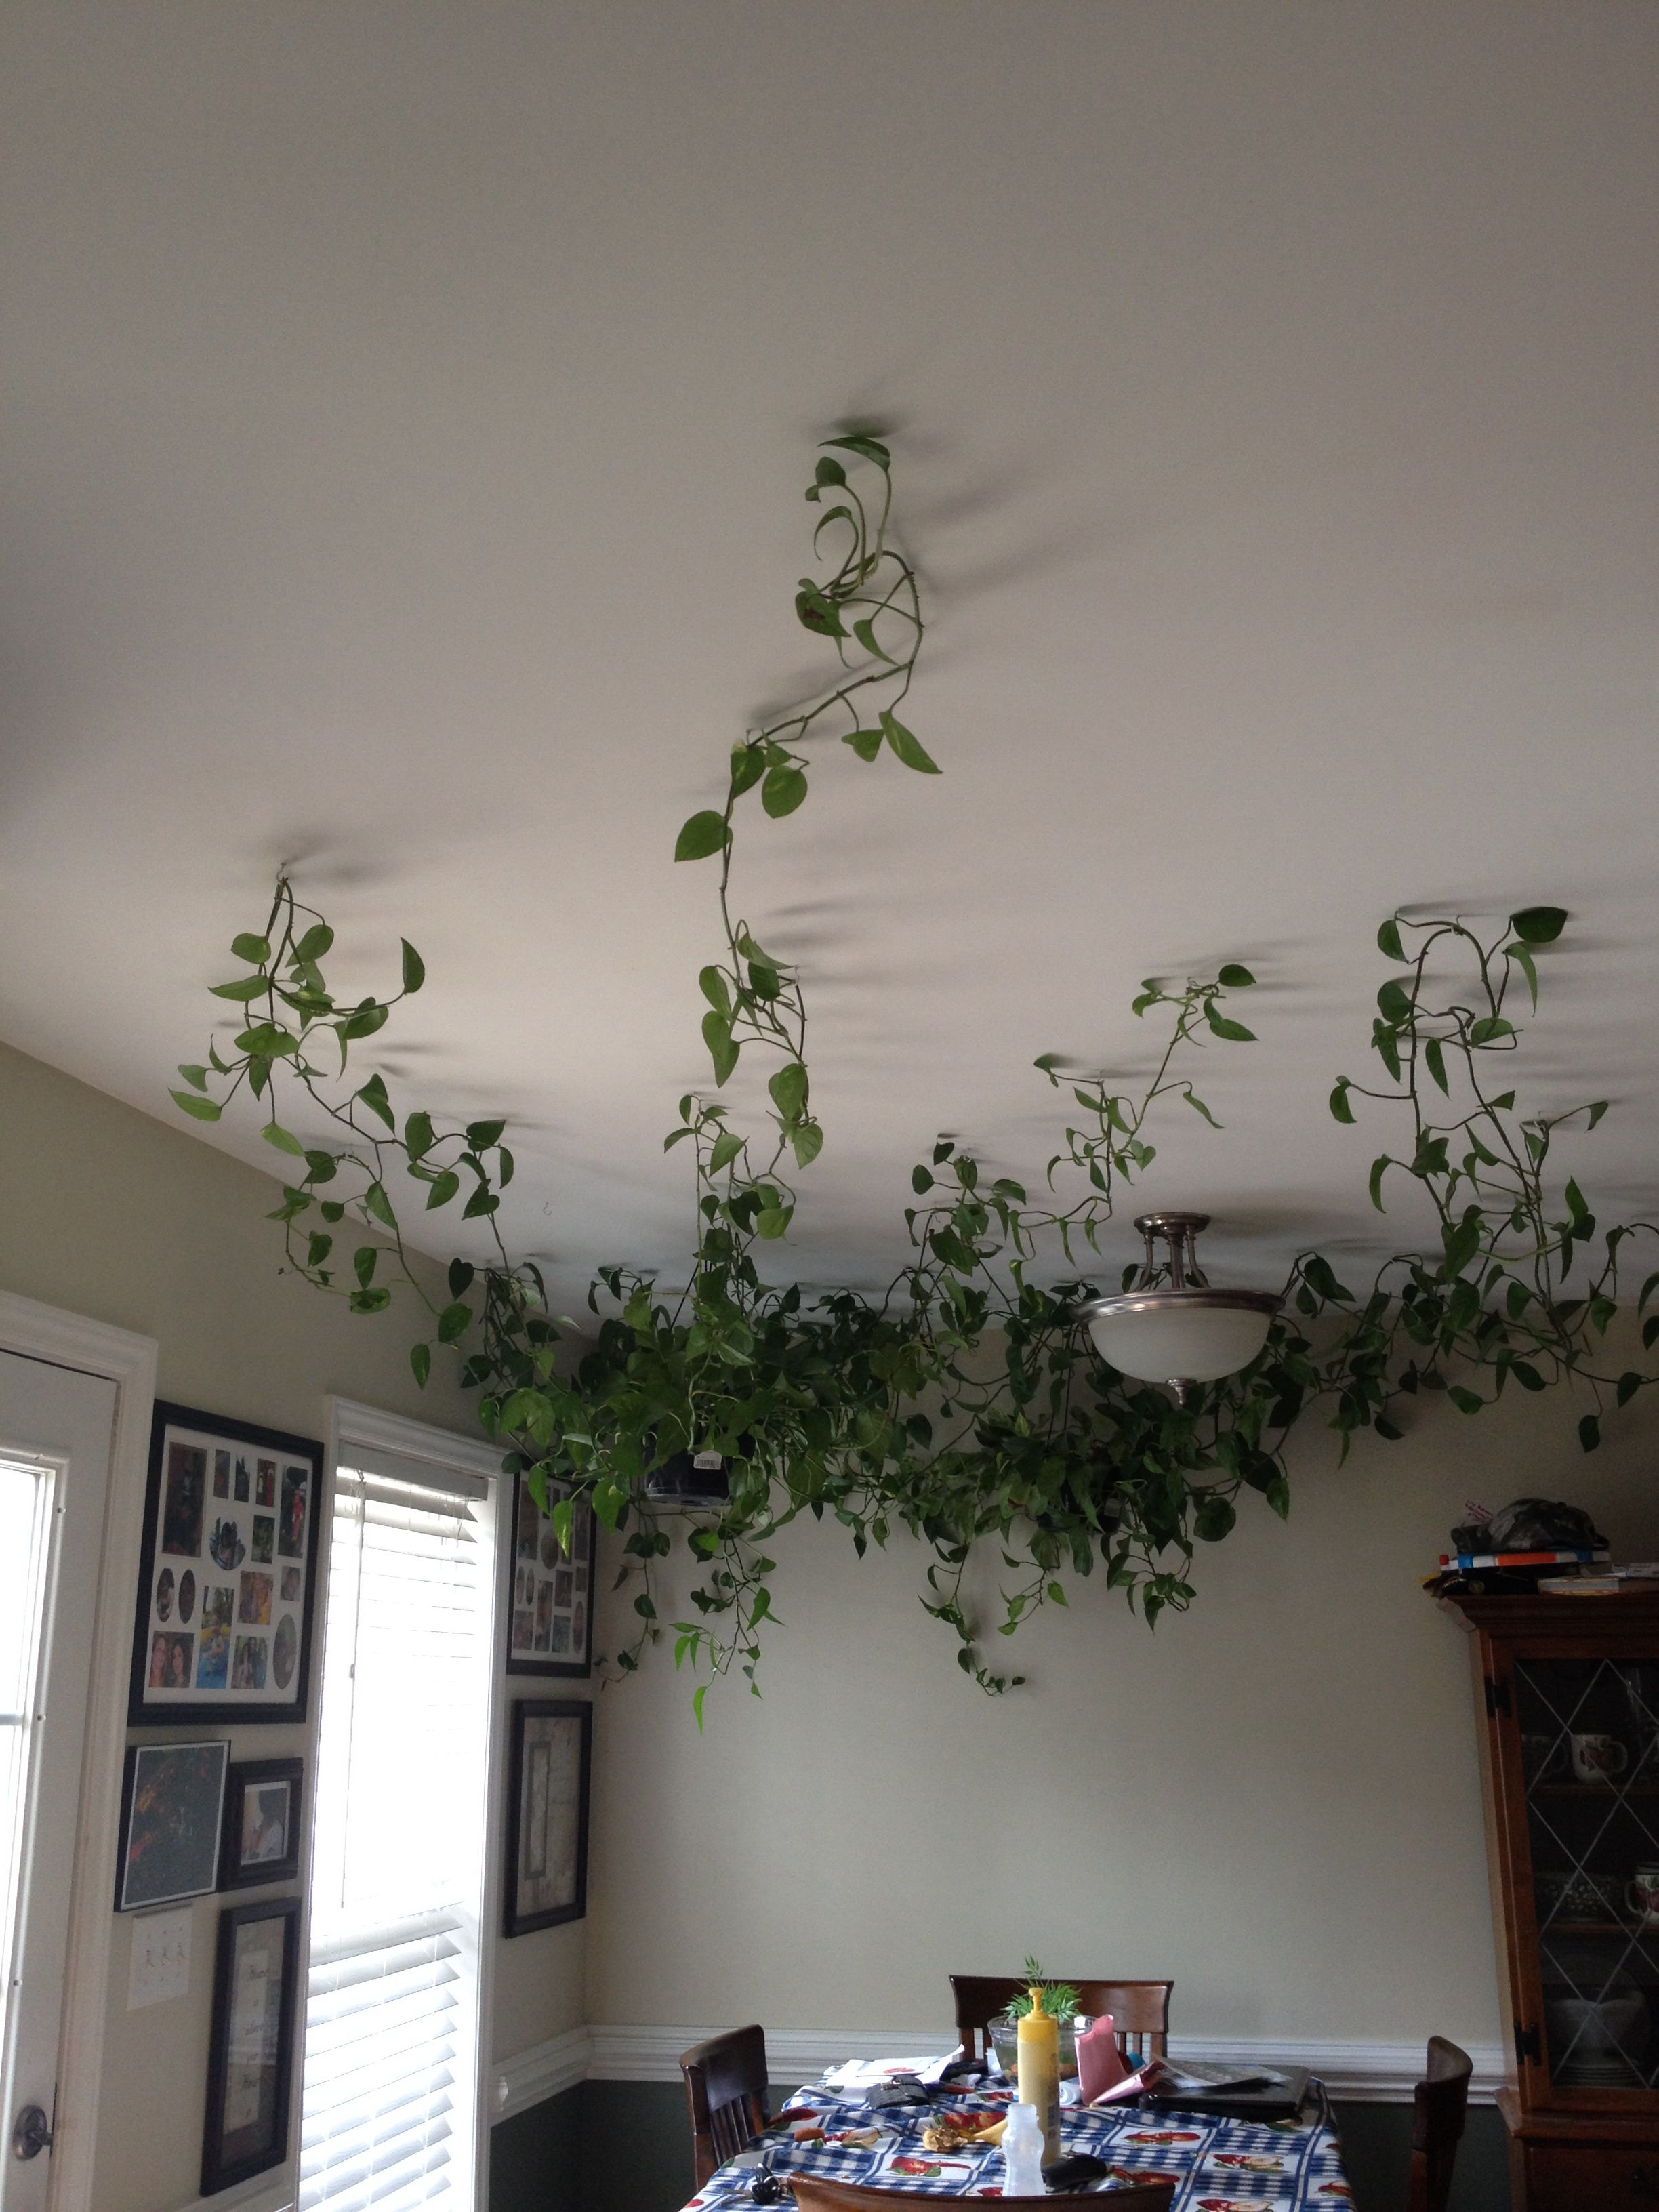 hanging vine plants across